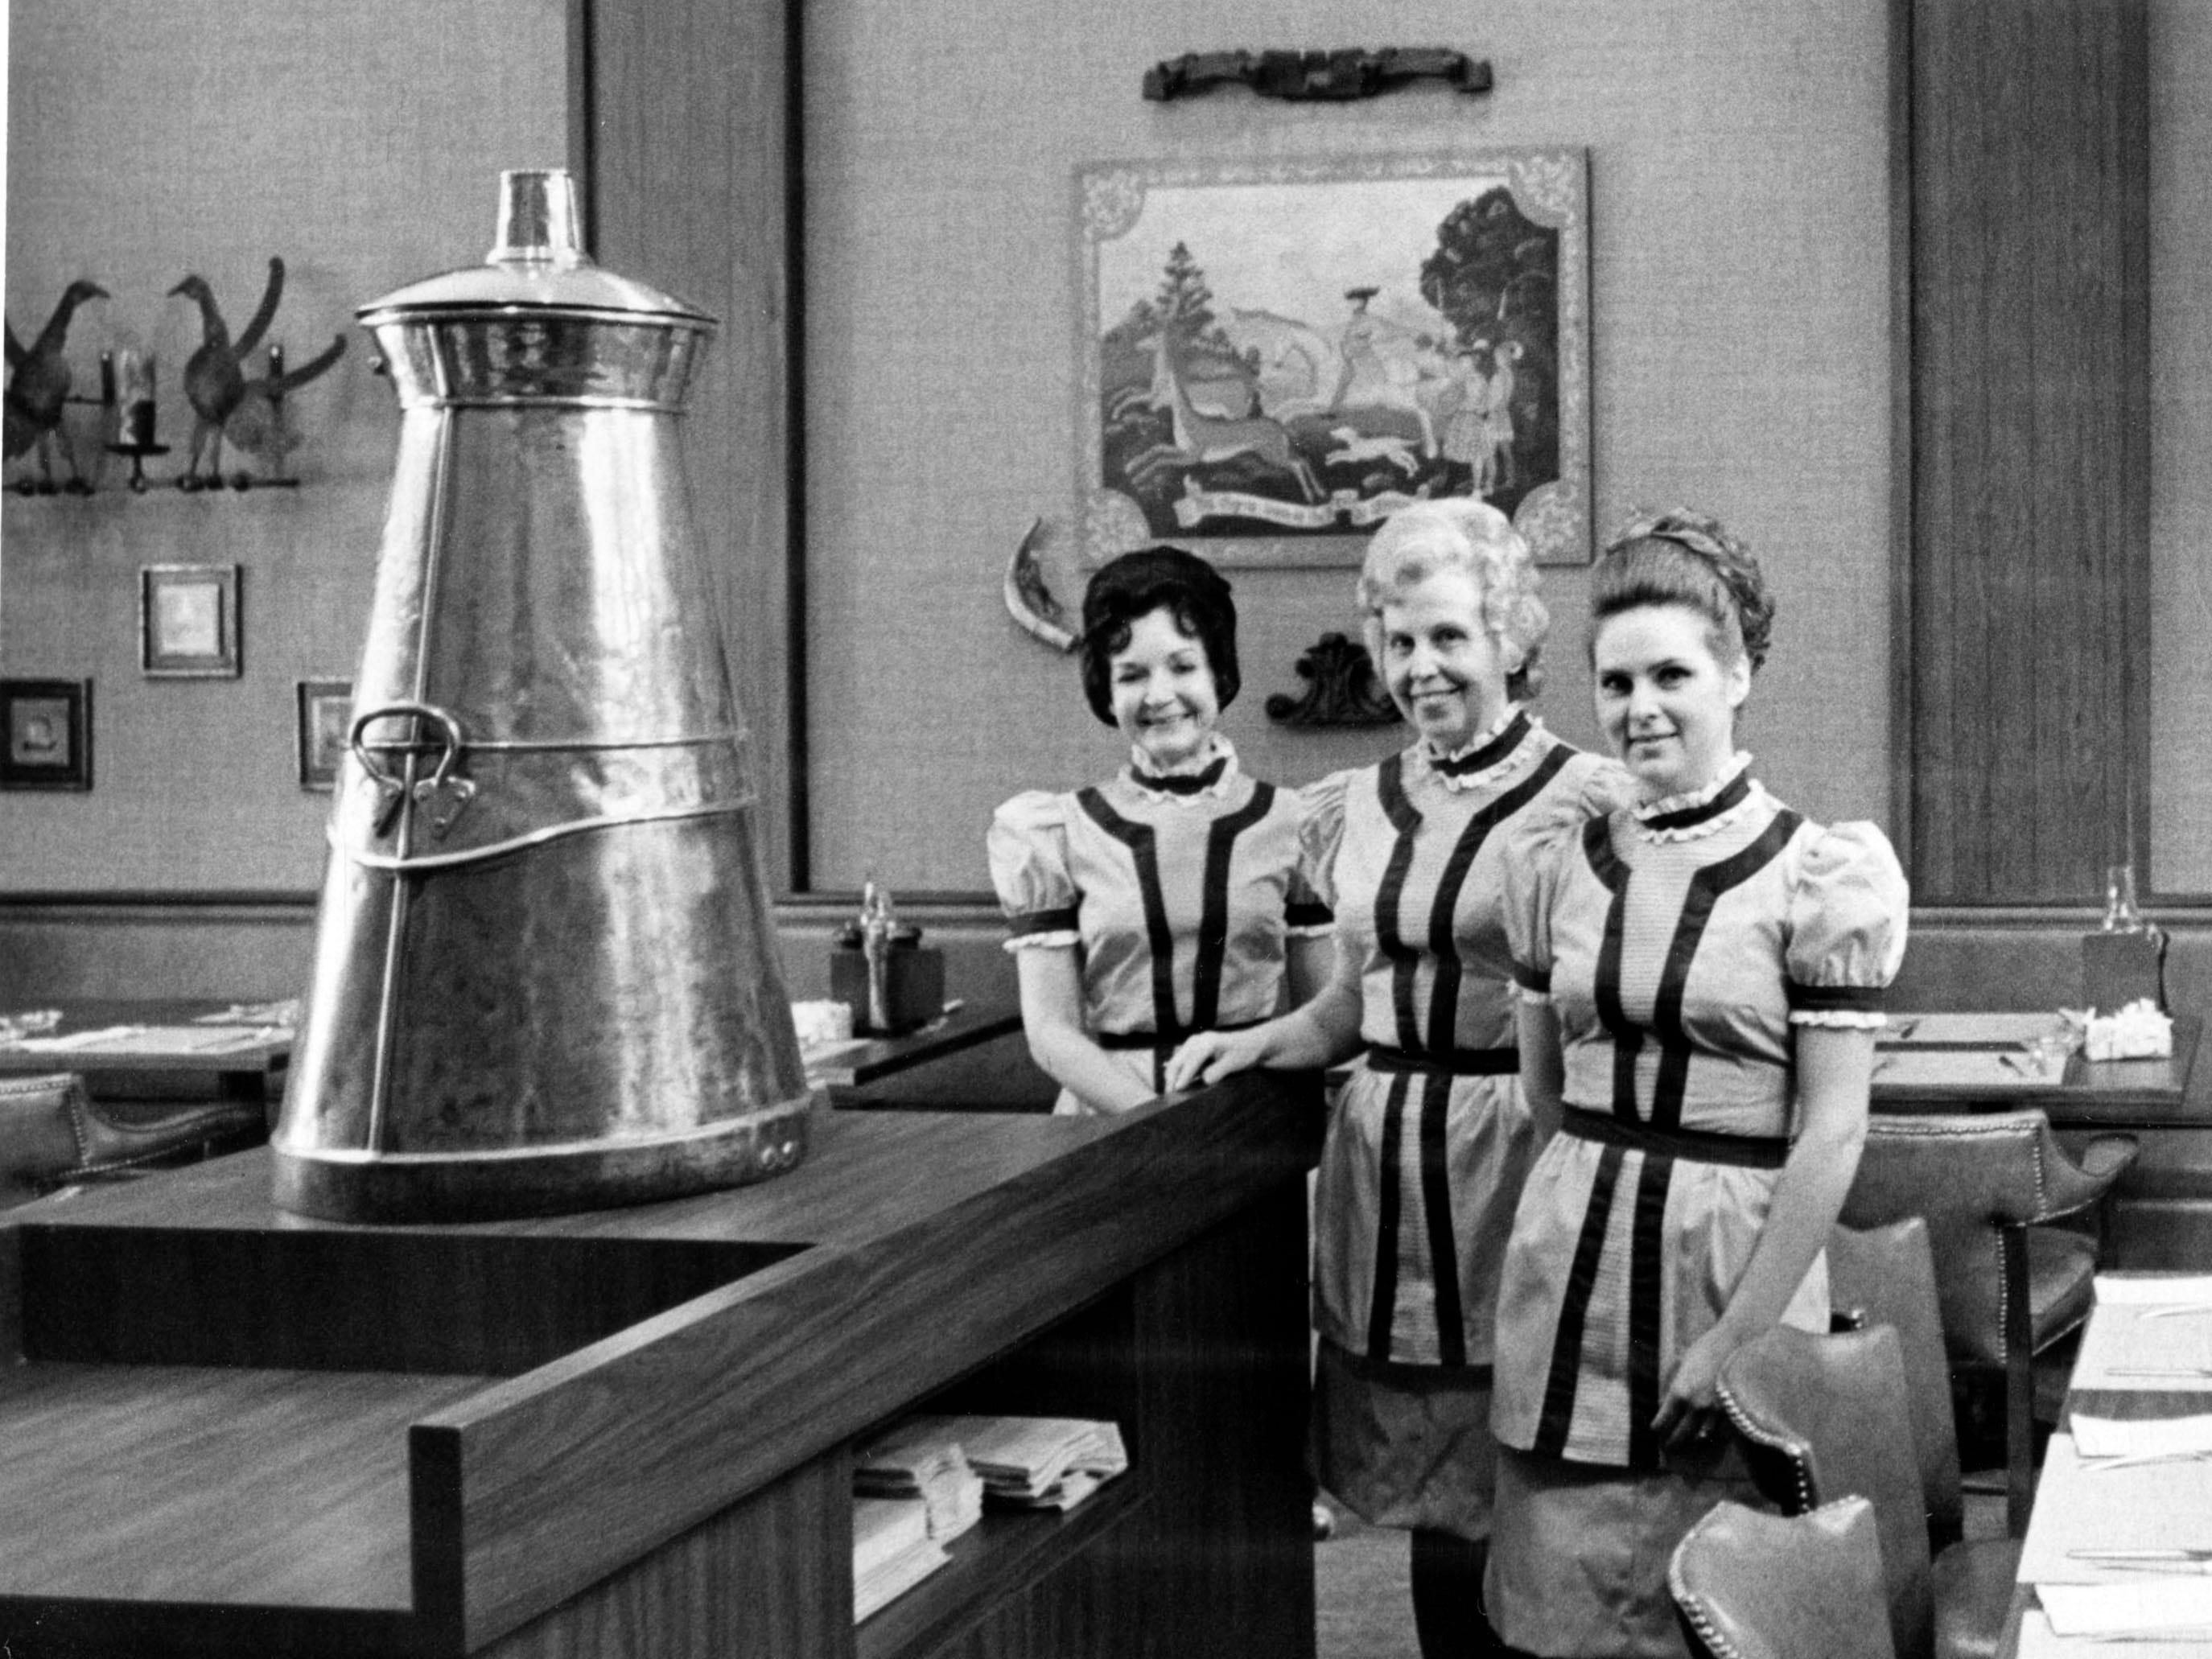 Regas Restaurant waitresses, from left, Bobbie Foley, Hazel Schmid, and Phyllis Whitt in 1973.